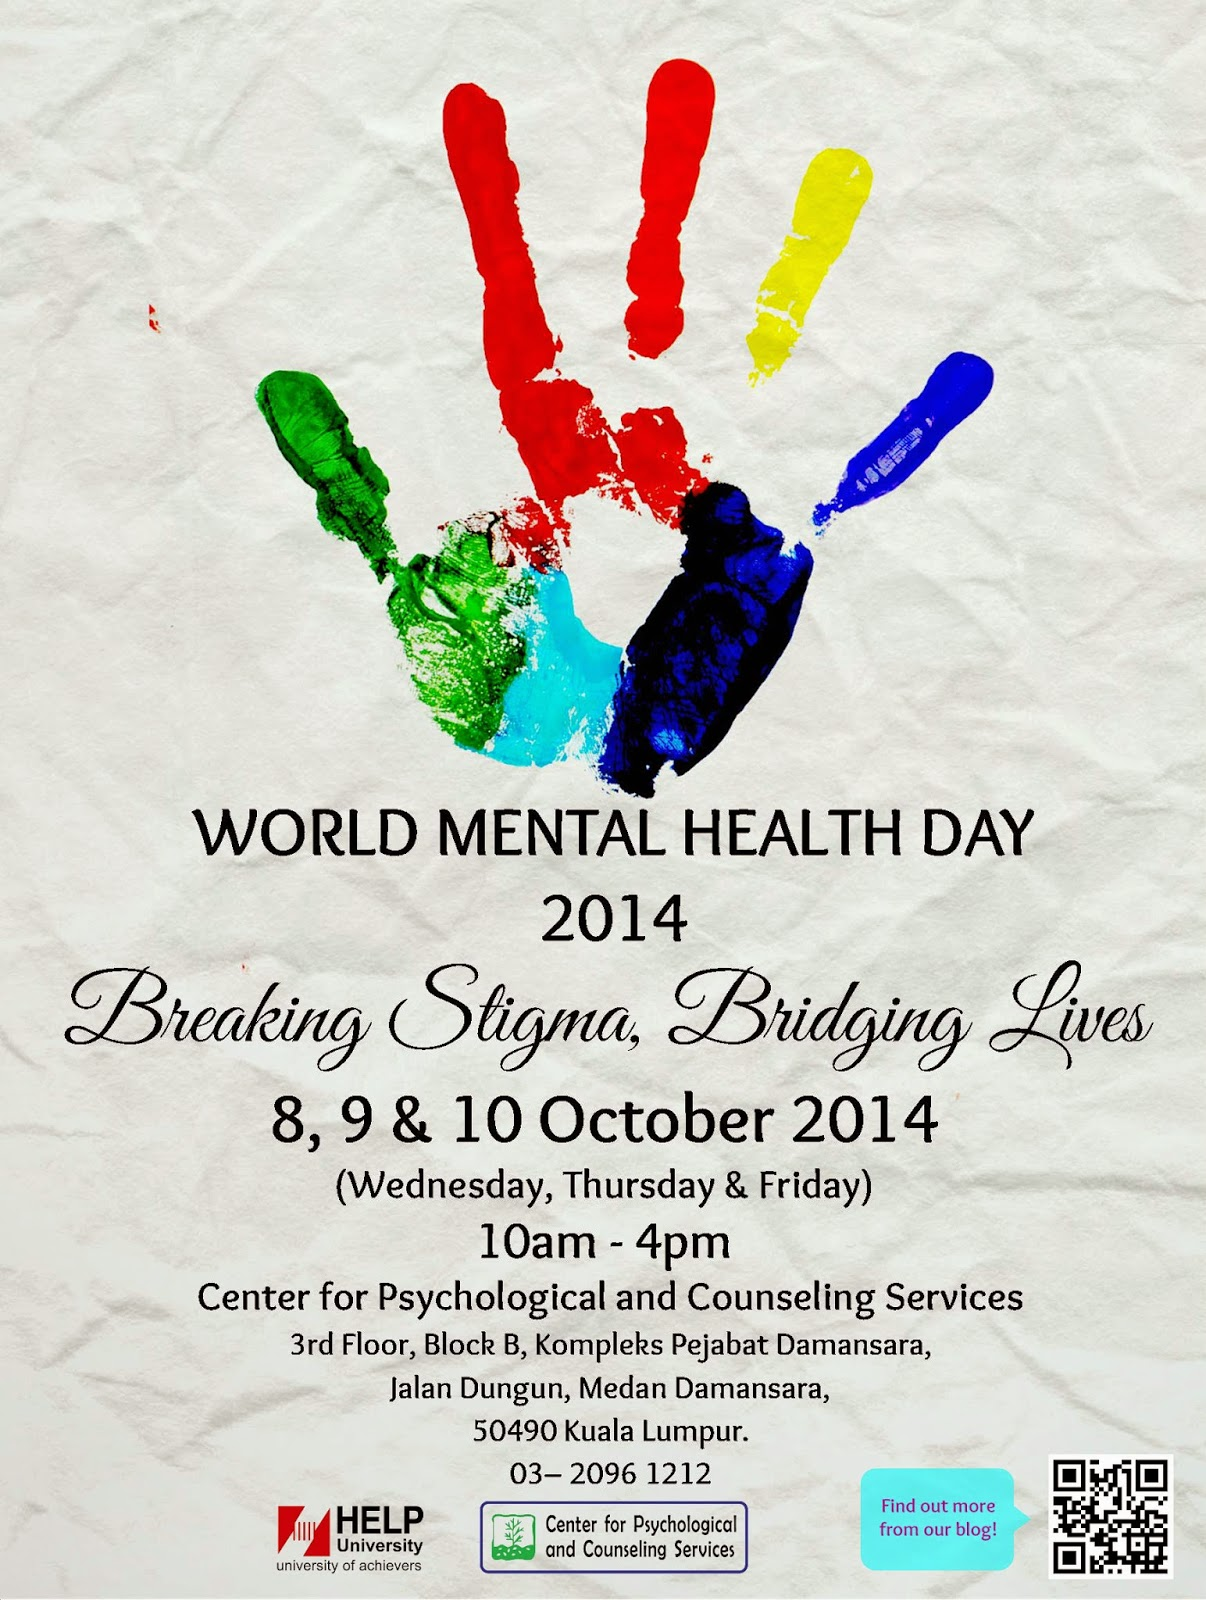 World Mental Health Day 2014